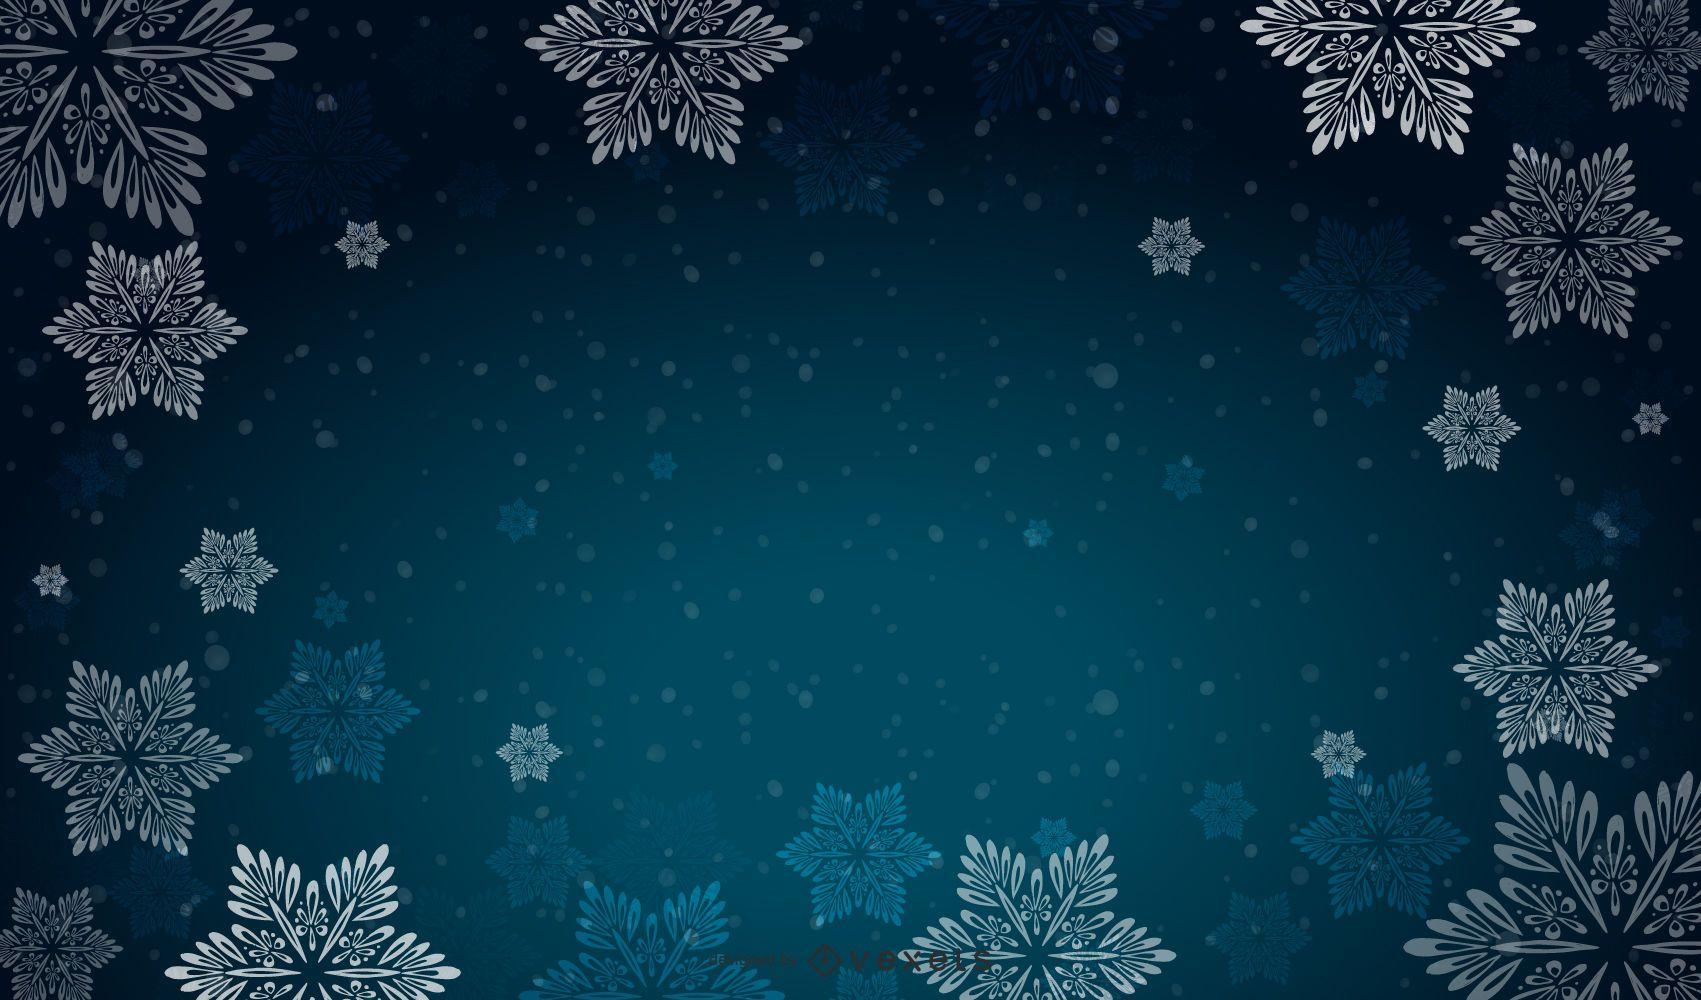 Background Vector Snow